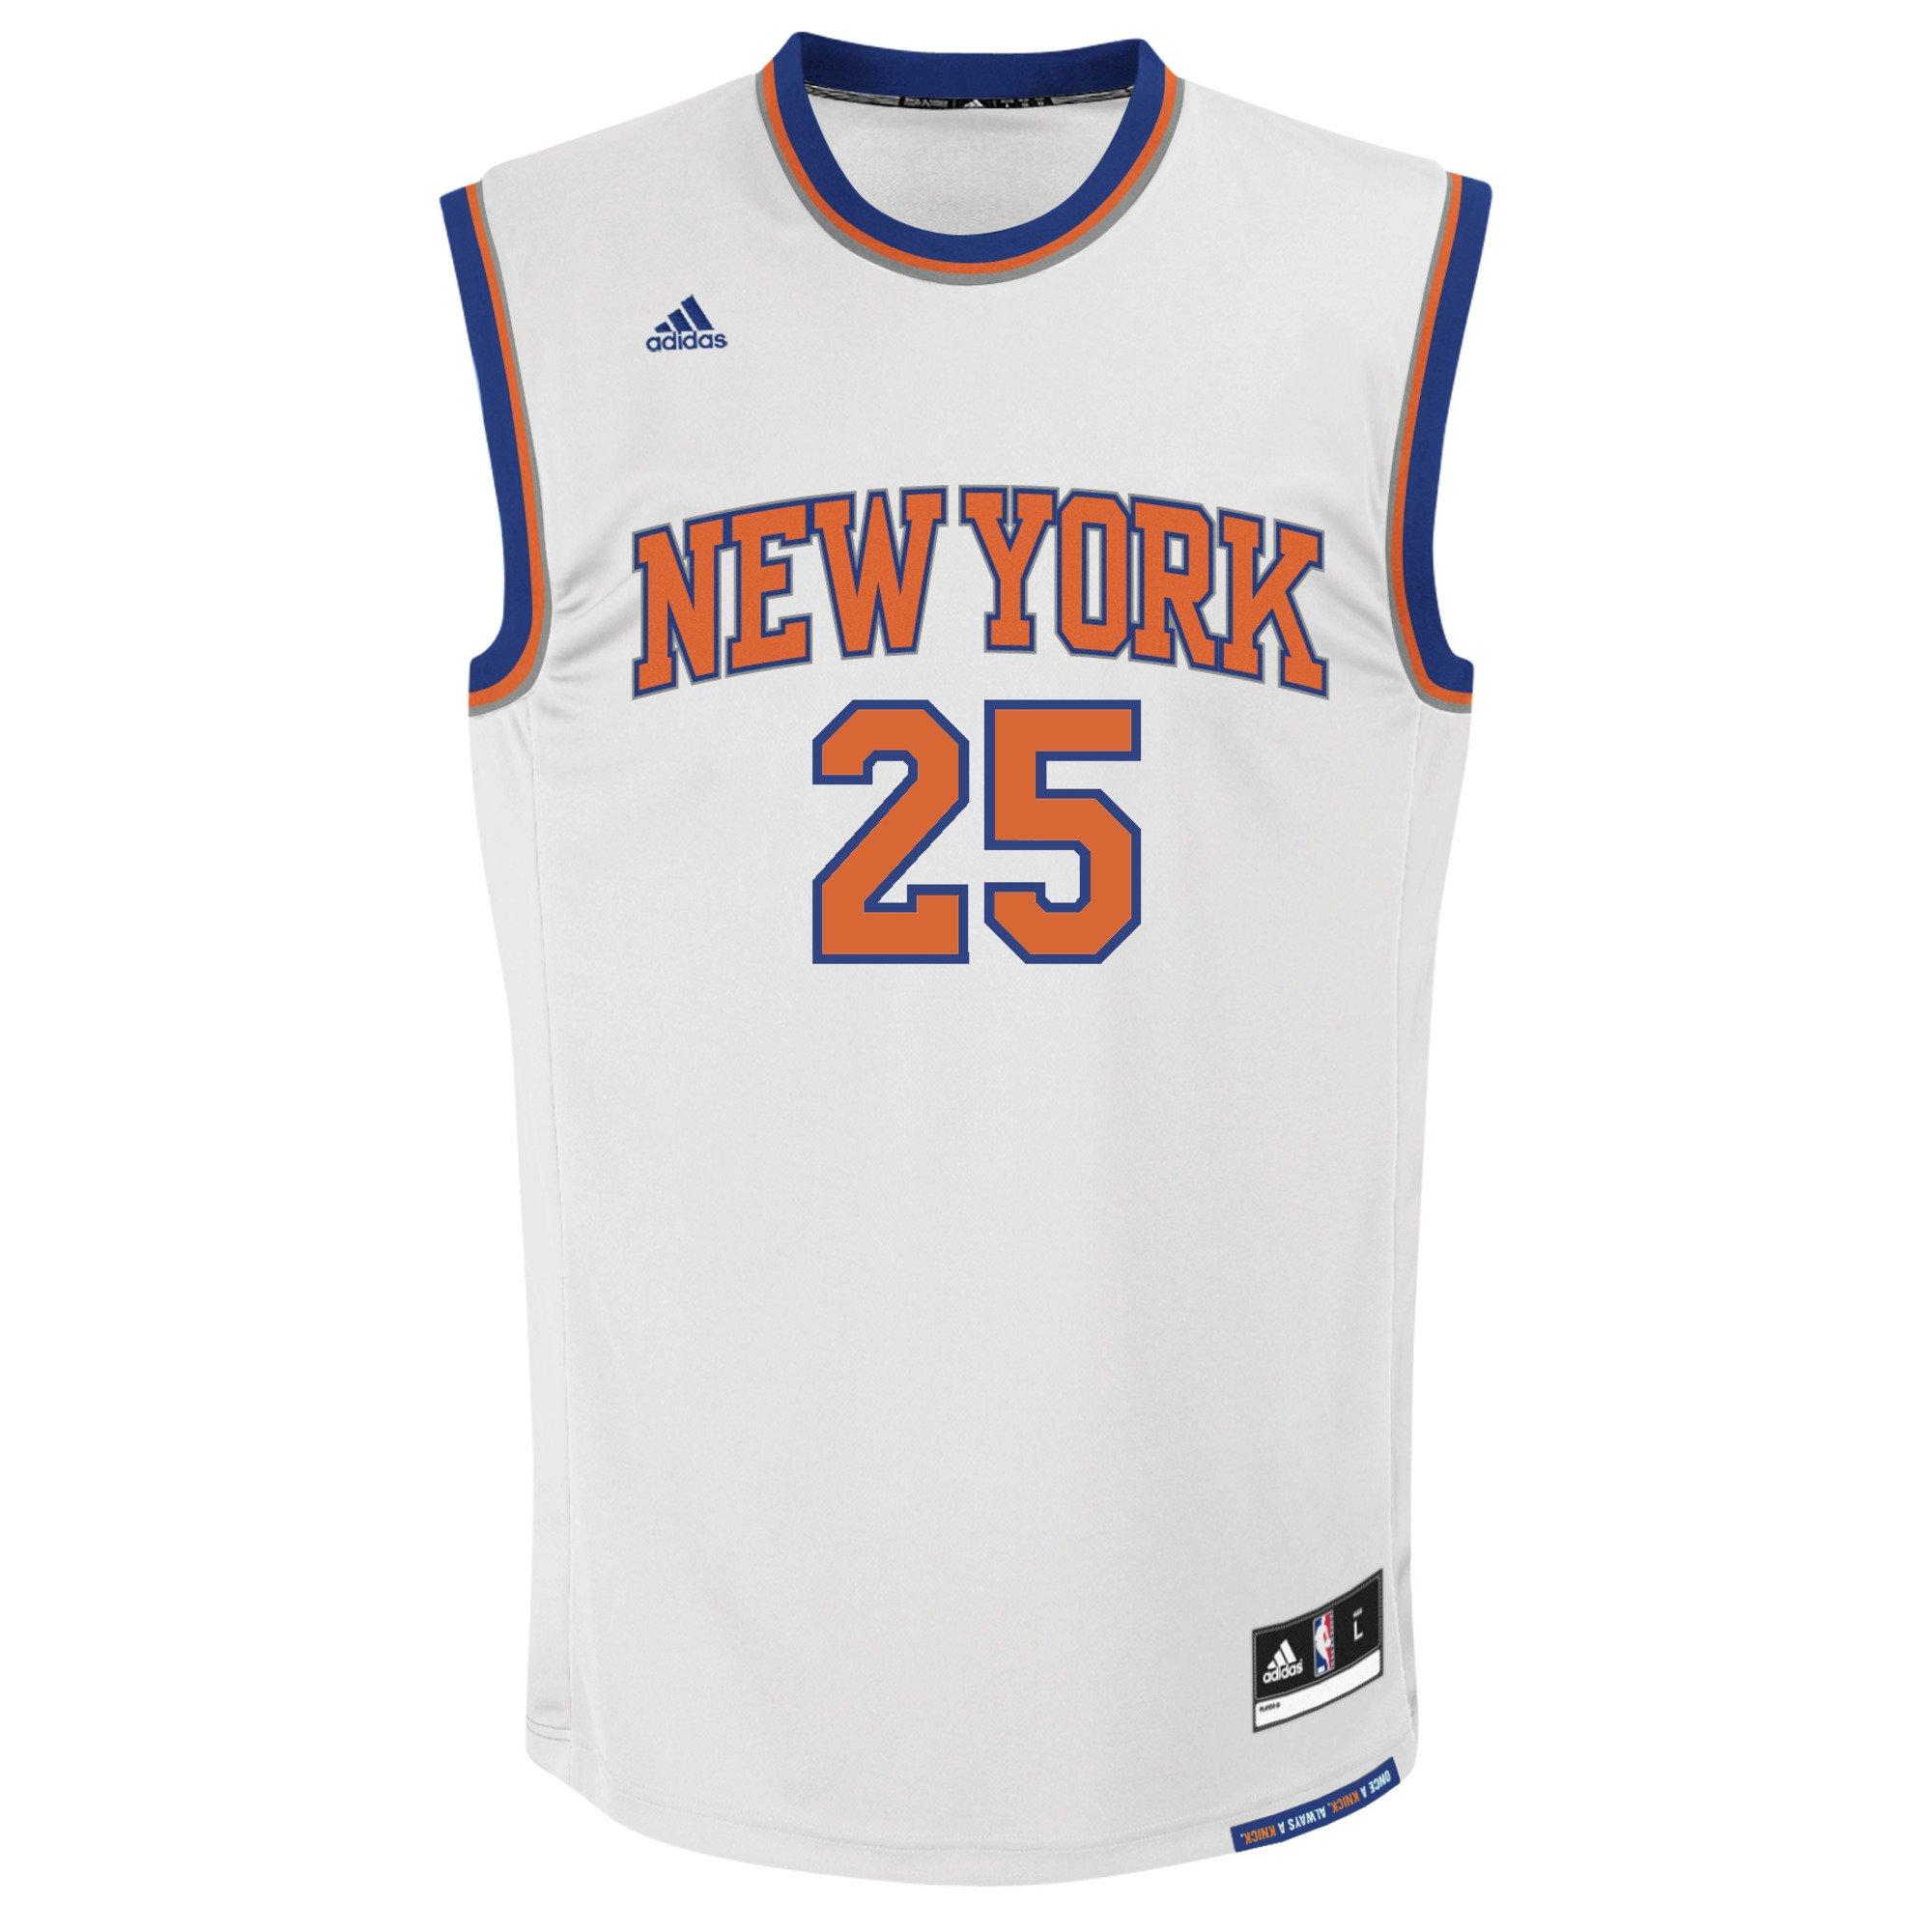 buy popular e3f3f e9db2 NBA Men's New York Knicks Derrick Rose Replica Player Home Jersey, Small,  White